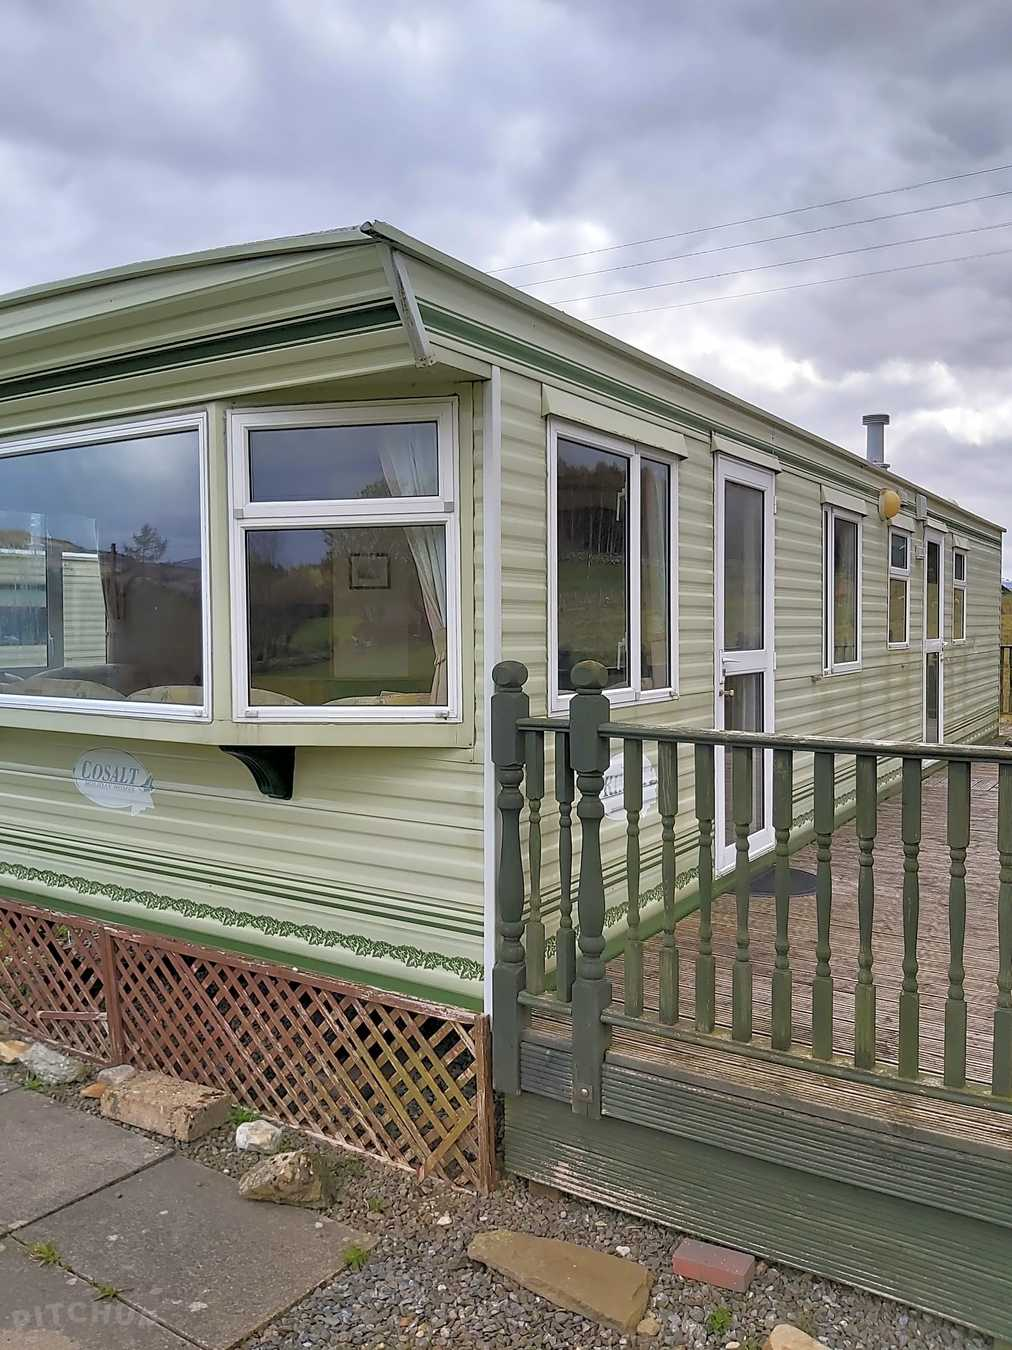 Cruachan Farm Caravan and Camping Park, Killin   Aktualisierte ...